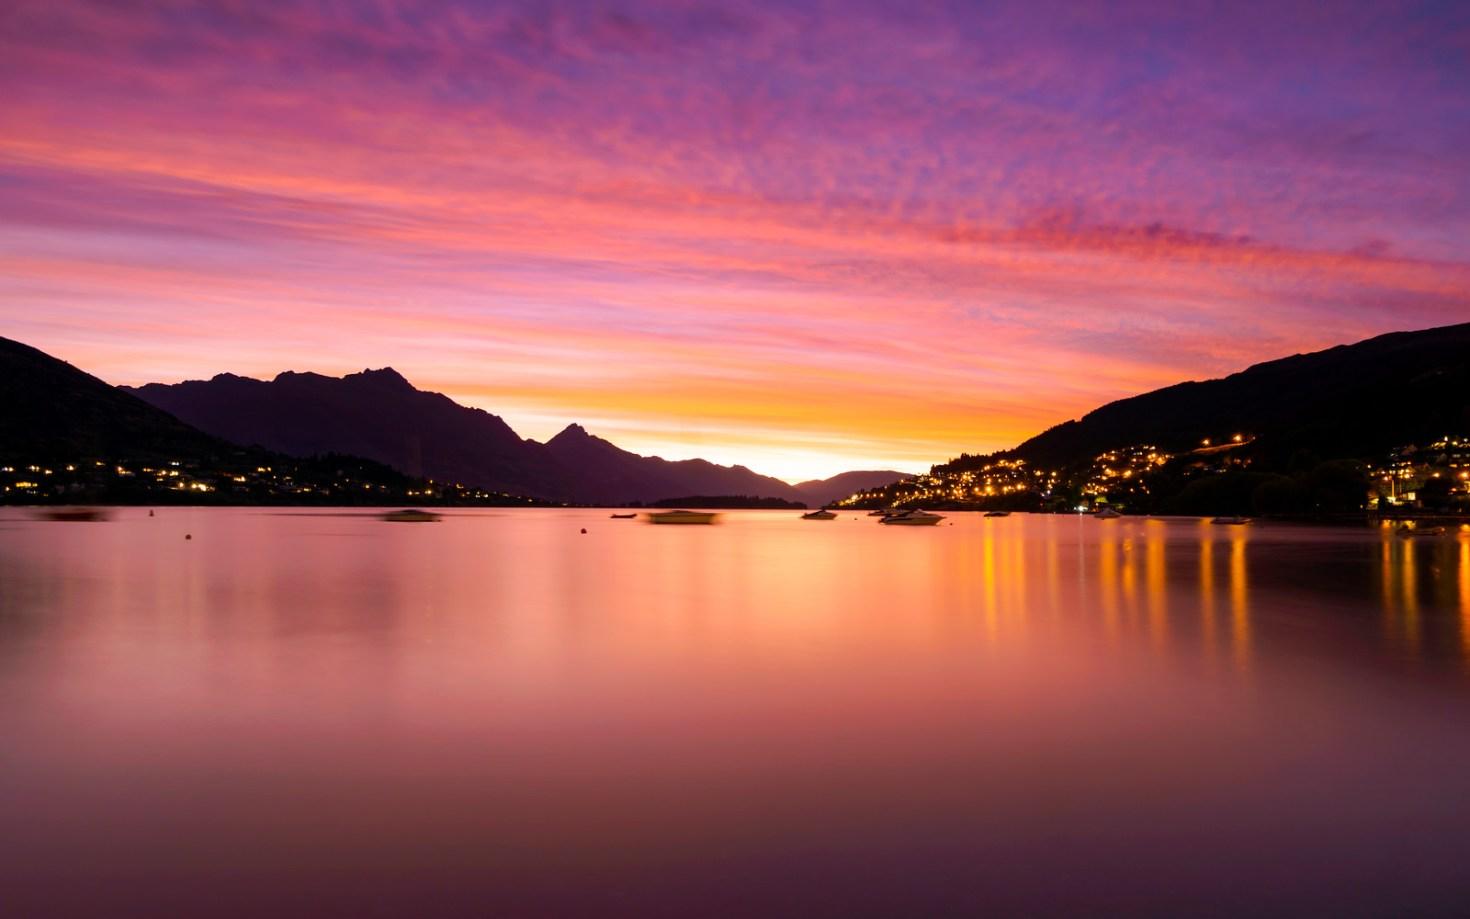 New Zealand - Sunset over Lake Wakatipu